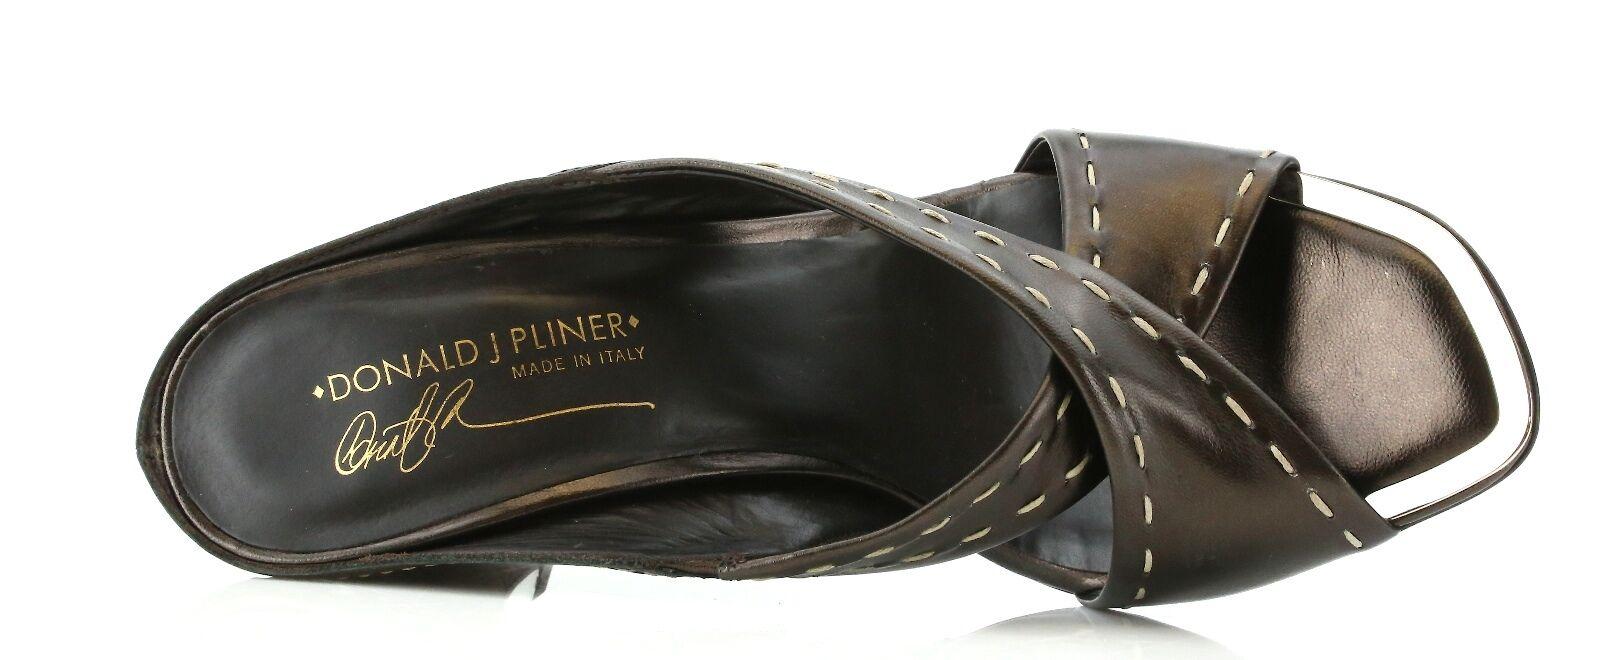 Donald NIDRA J Pliner NIDRA Donald Braun Leder Wedge Sandales 7258 Größe 8.5 M NEW 220cdb